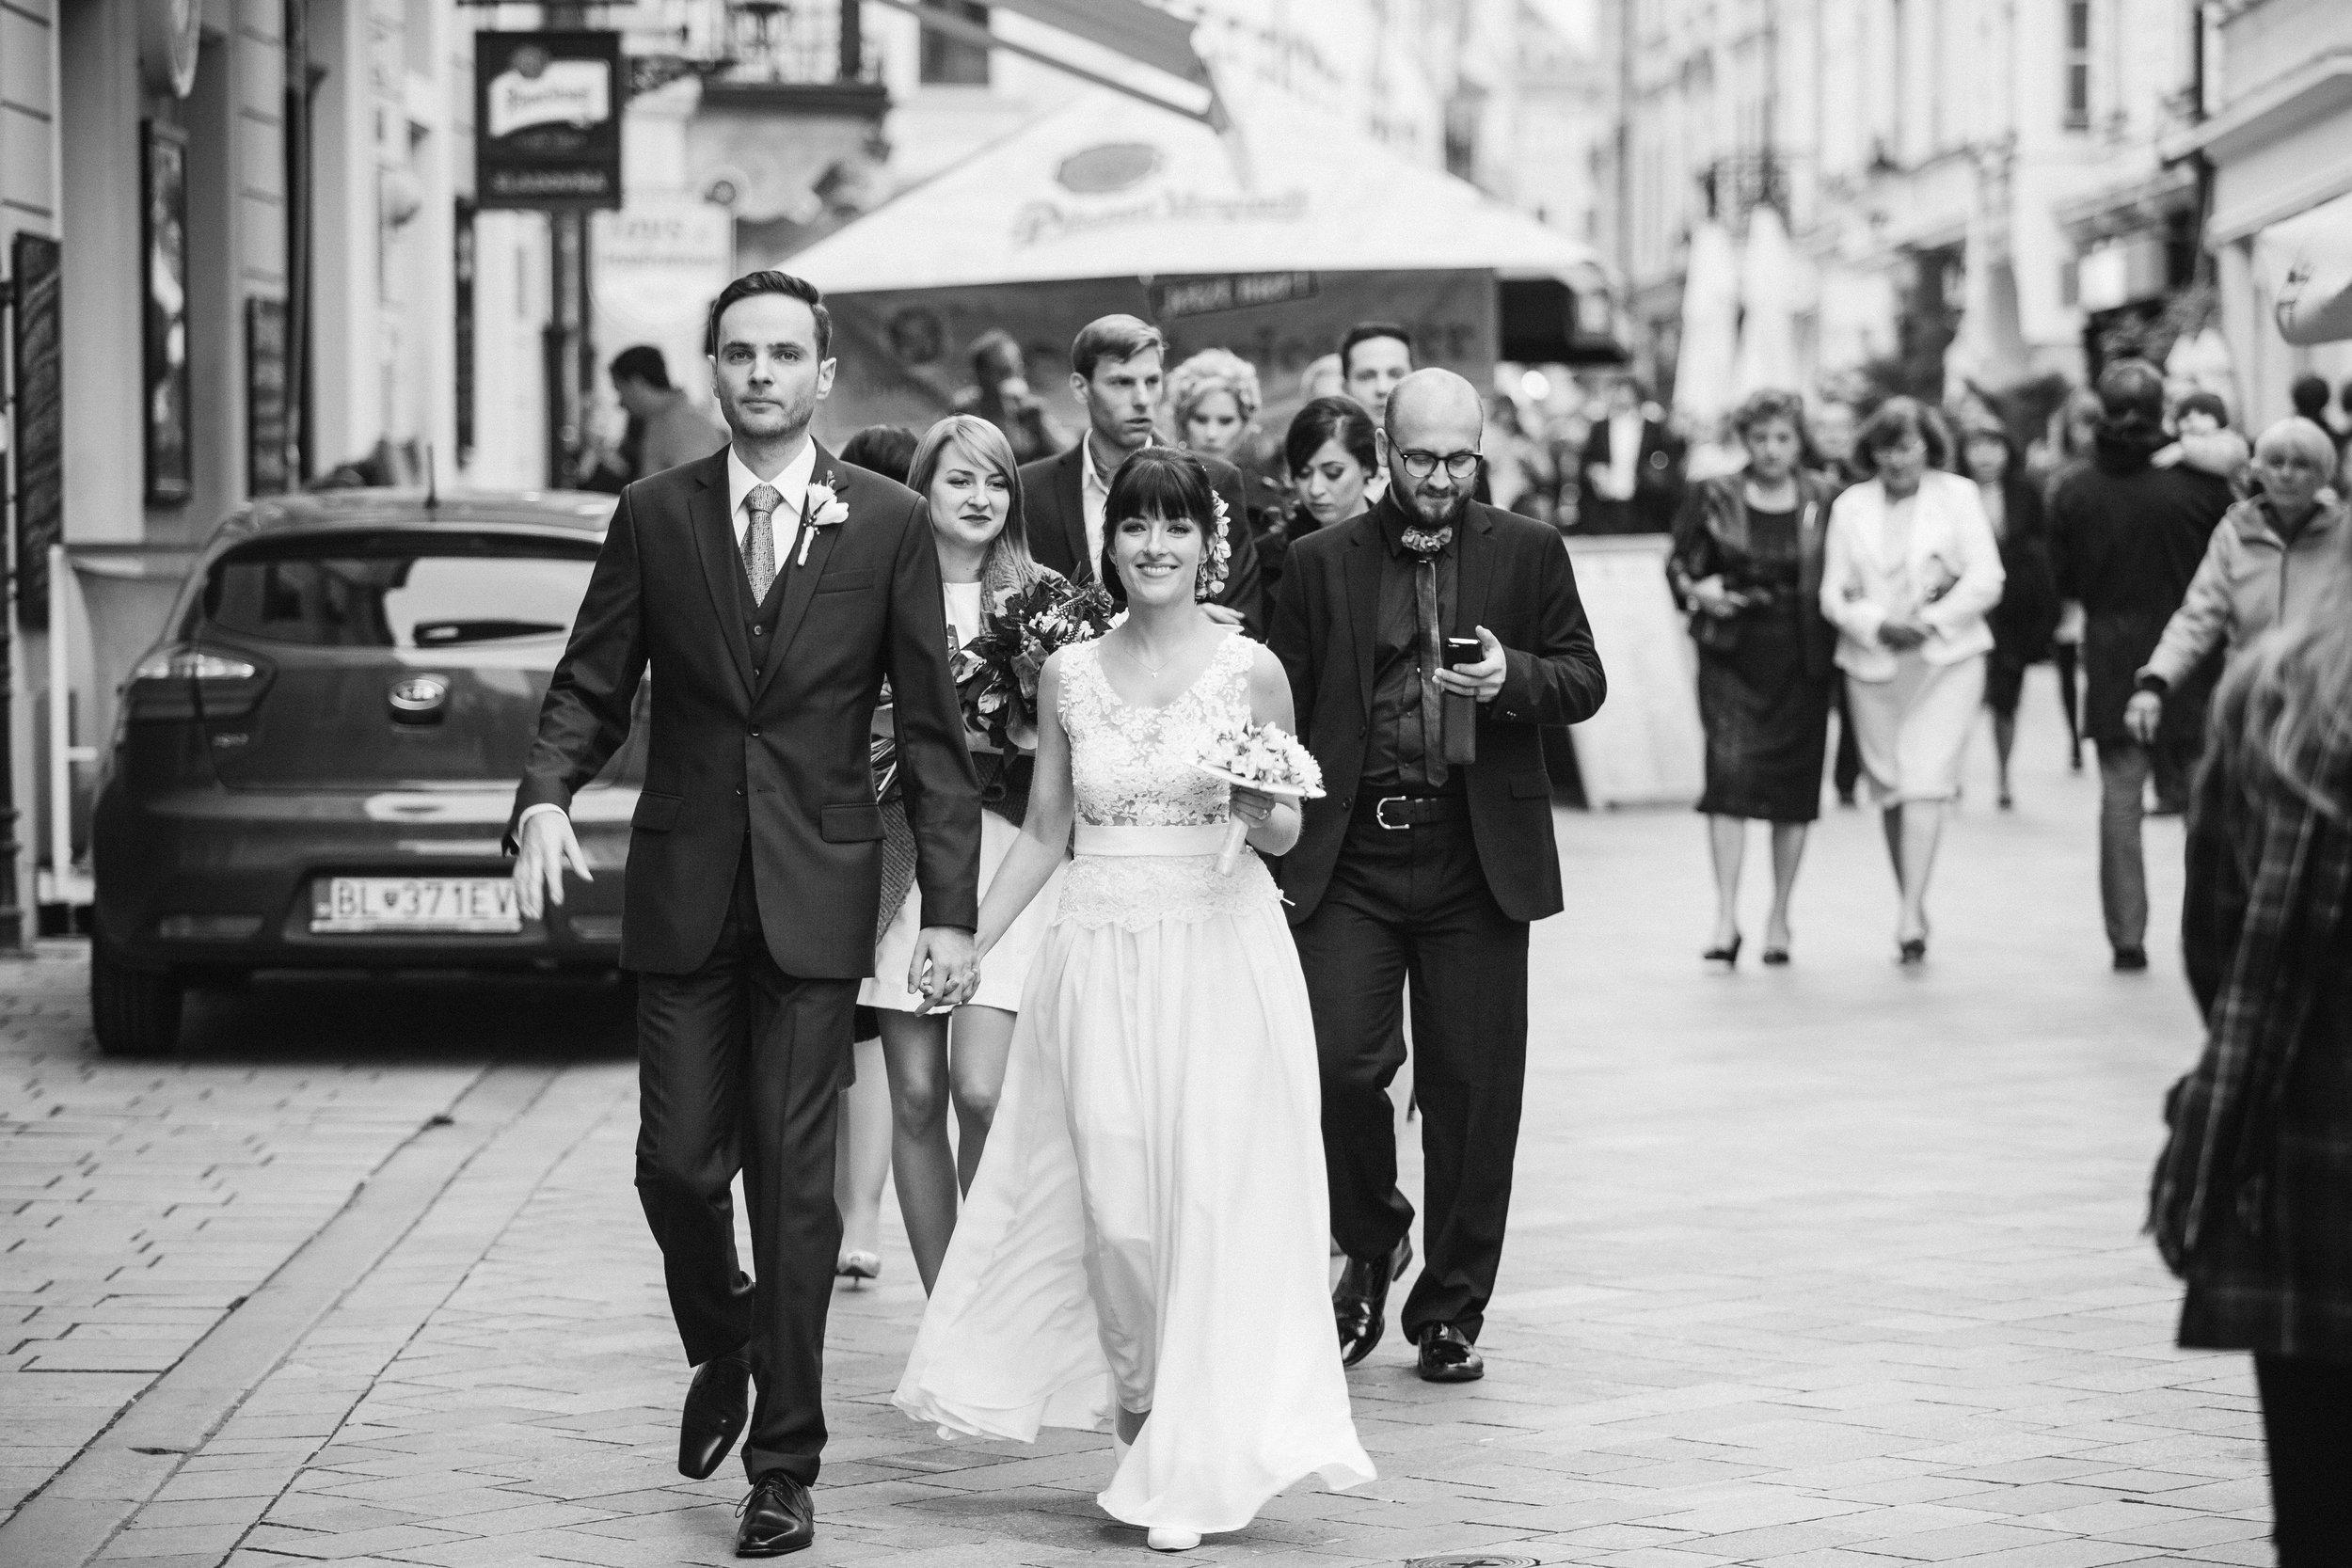 destination-wedding-photographer-slovakia-bratislava-guests-bw-documentary-style-1.jpg